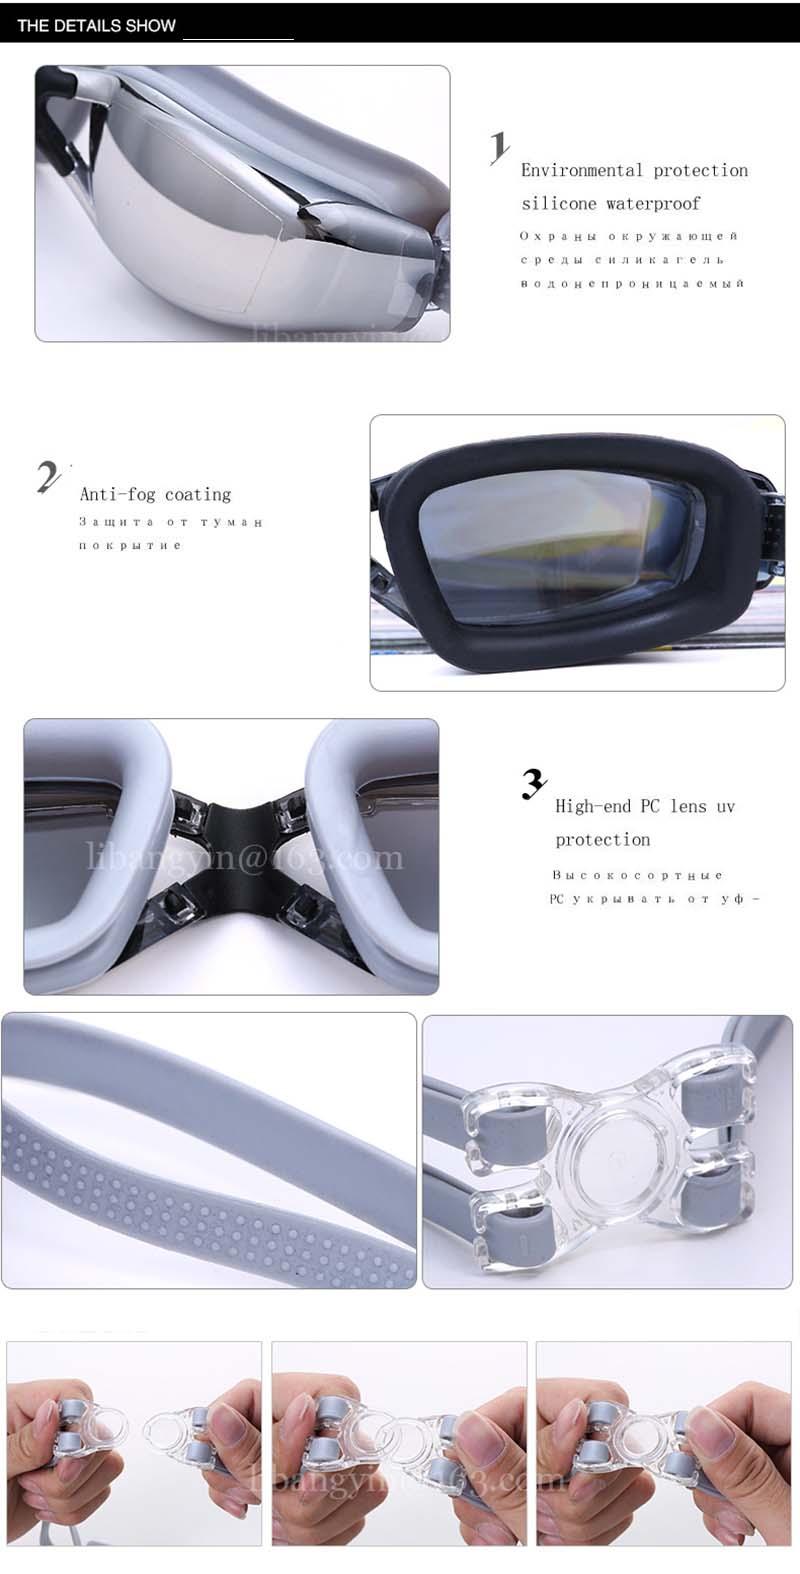 elite professional hd anti-fog swim goggles Elite Professional HD Anti-Fog Swim Goggles HTB1Wjs3PFXXXXXnXXXXq6xXFXXXv